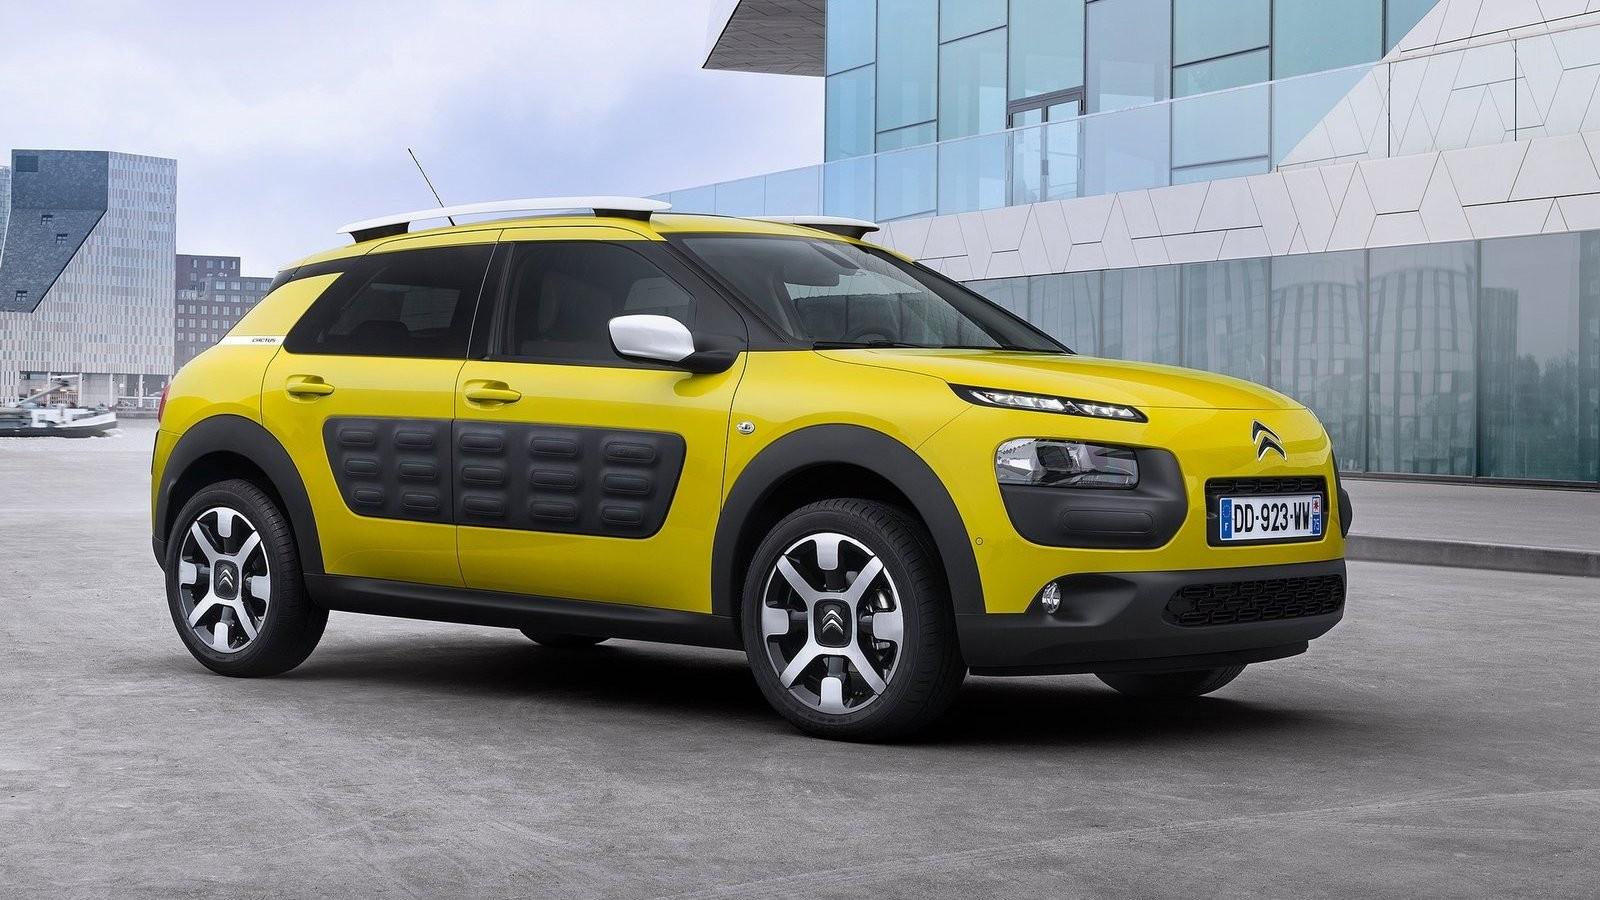 На фото: Citroën C4 Cactus